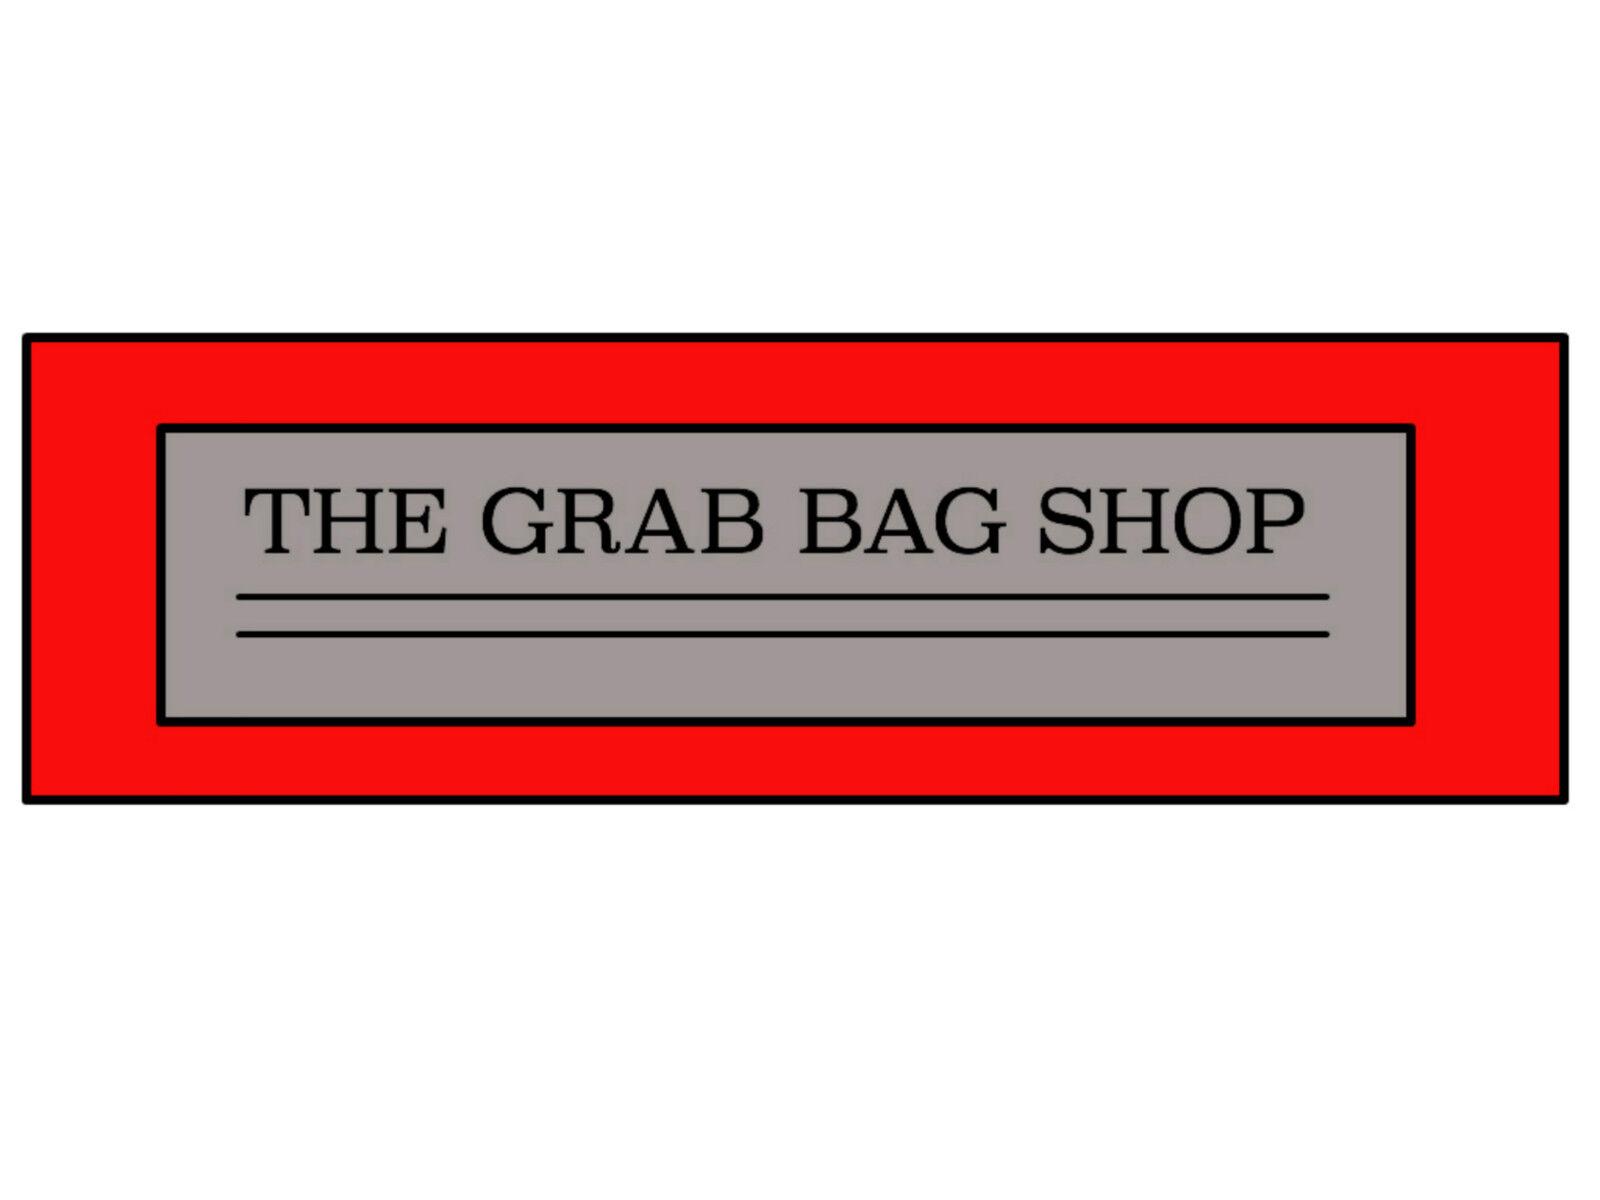 thegrabbagshop